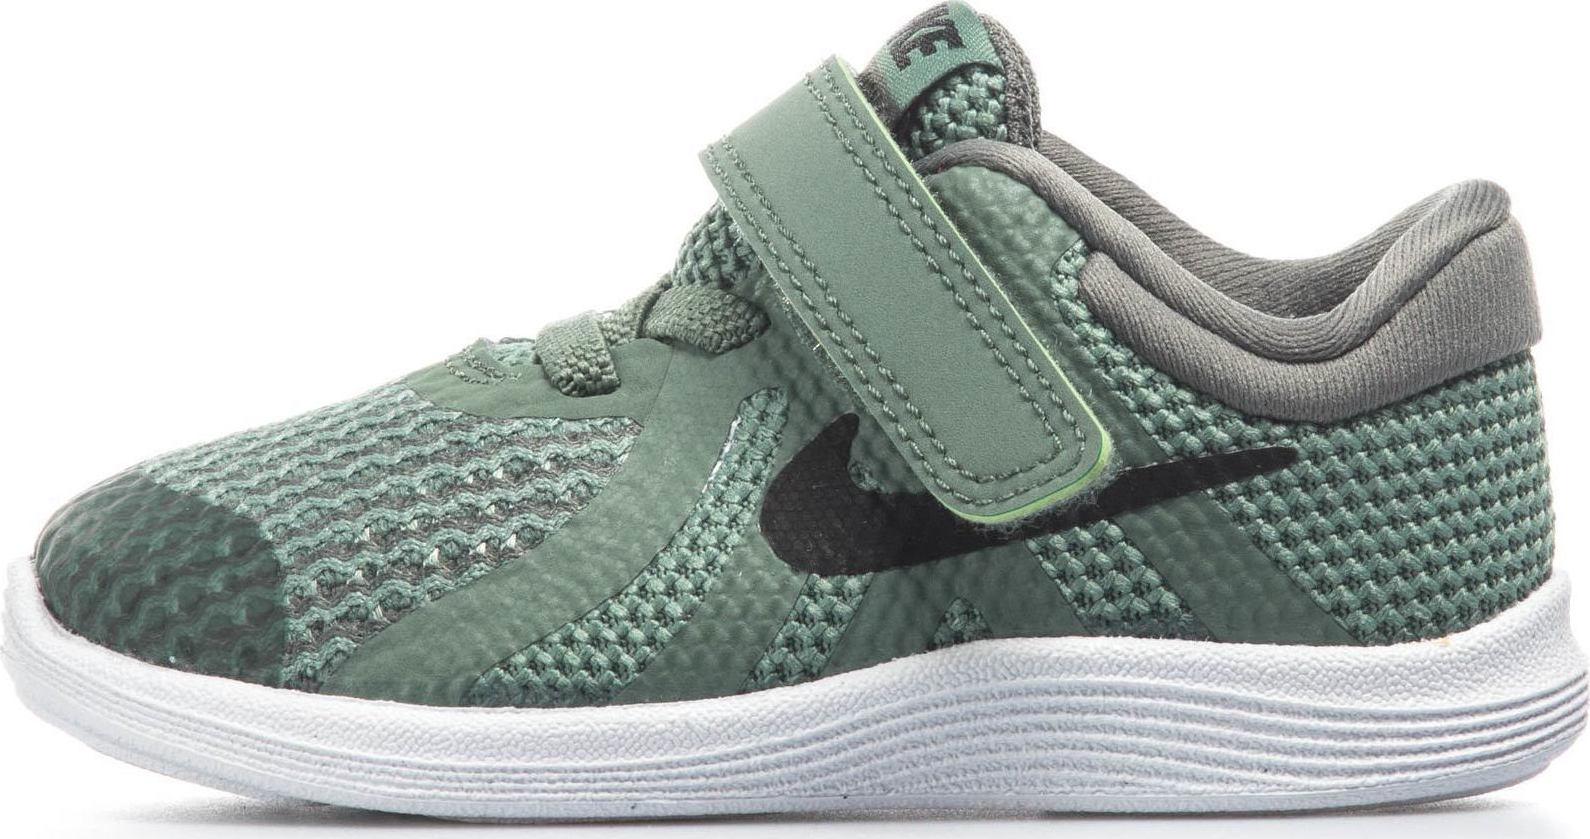 sneakers for cheap b932e 27296 Προσθήκη στα αγαπημένα menu Nike Revolution 4 TD Toddler